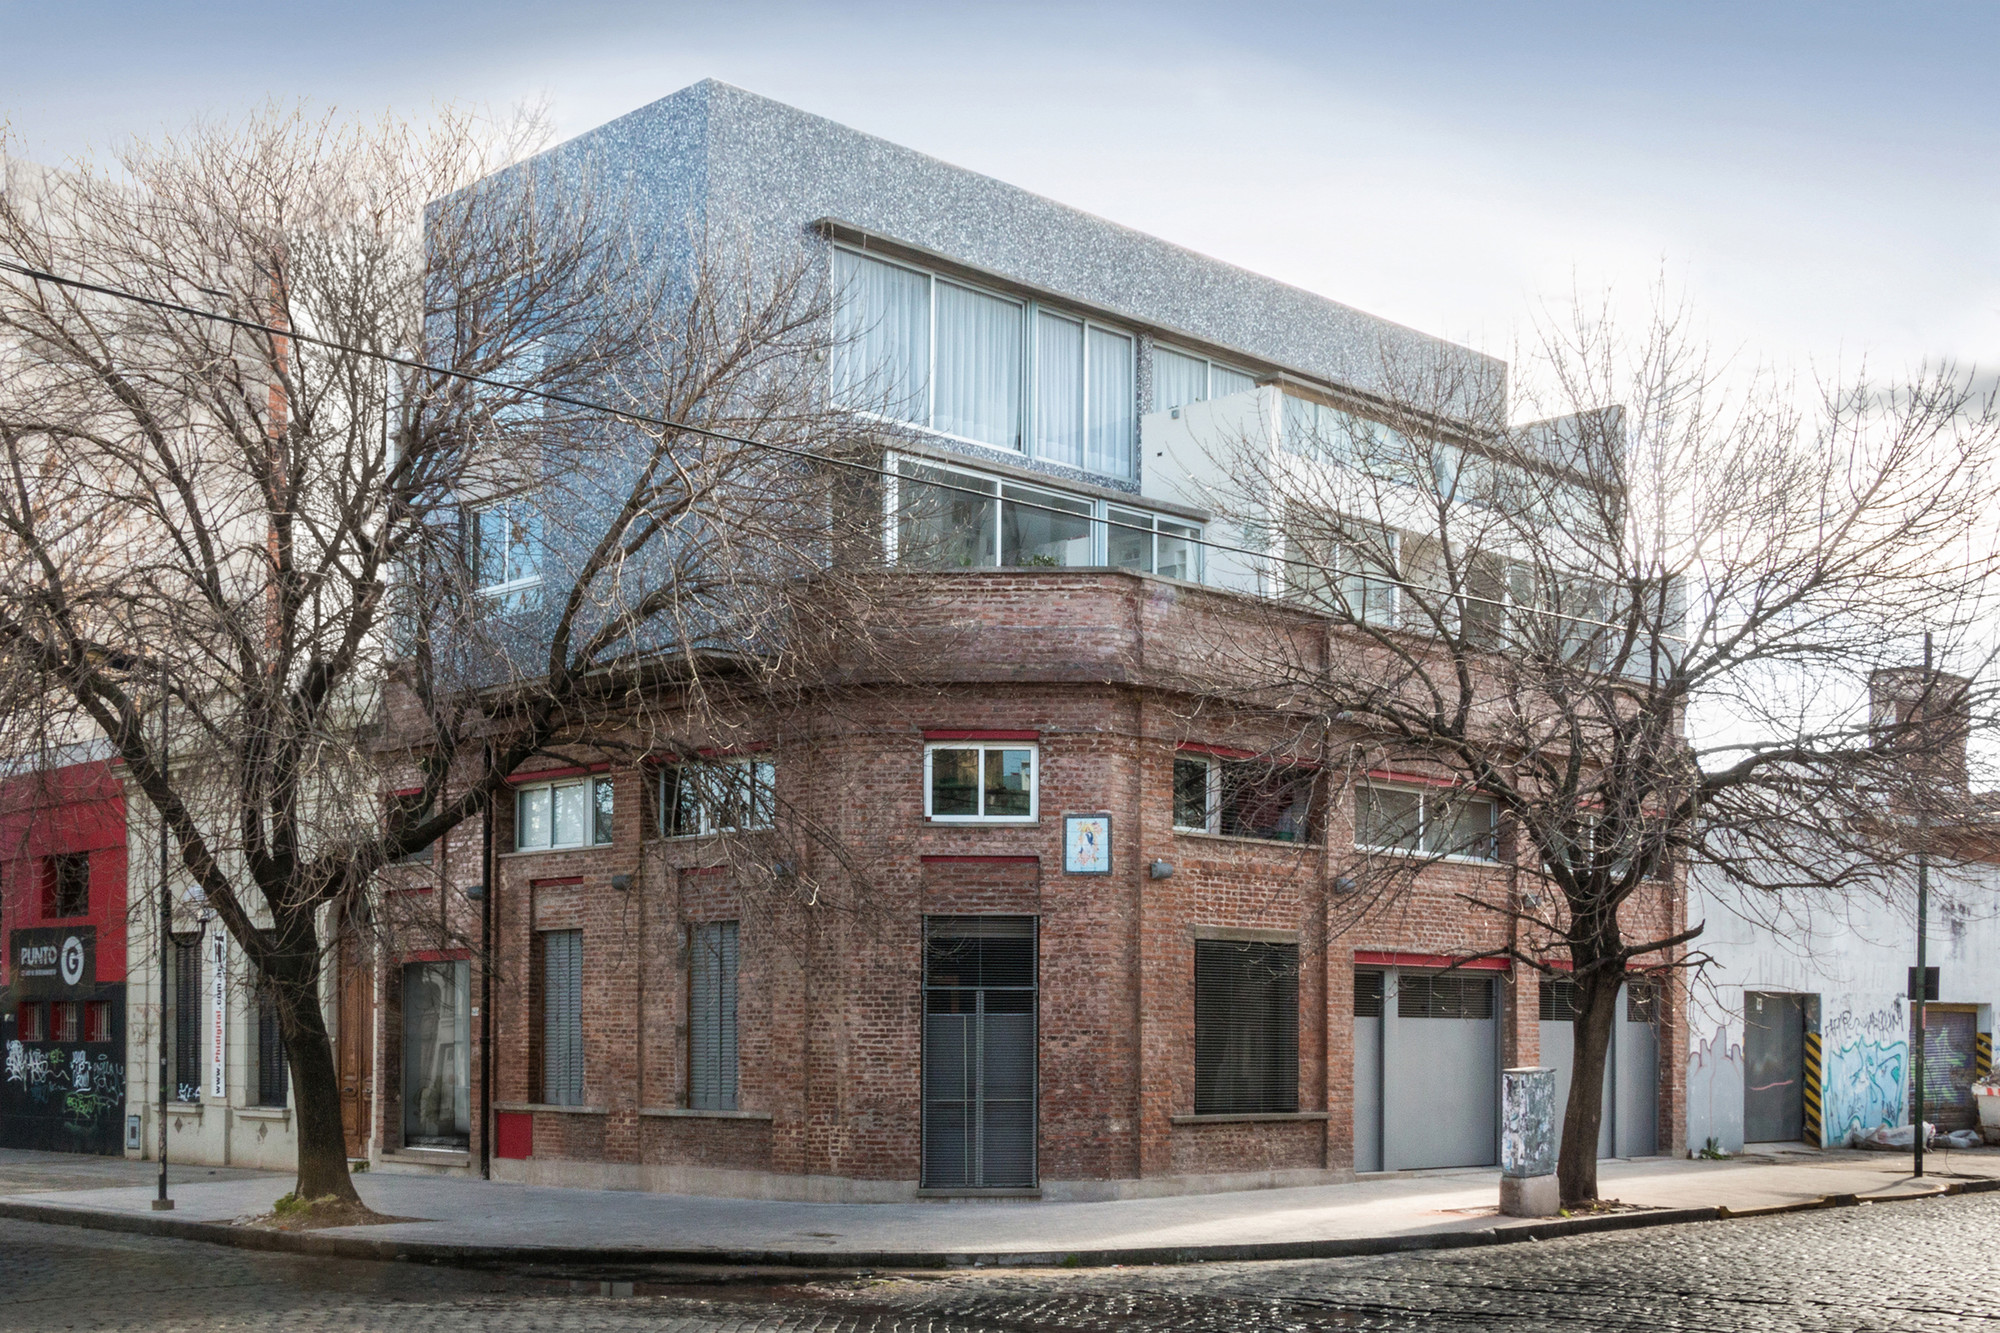 Edificio multifamiliar y local risso carasatorre risso for Local arquitectura